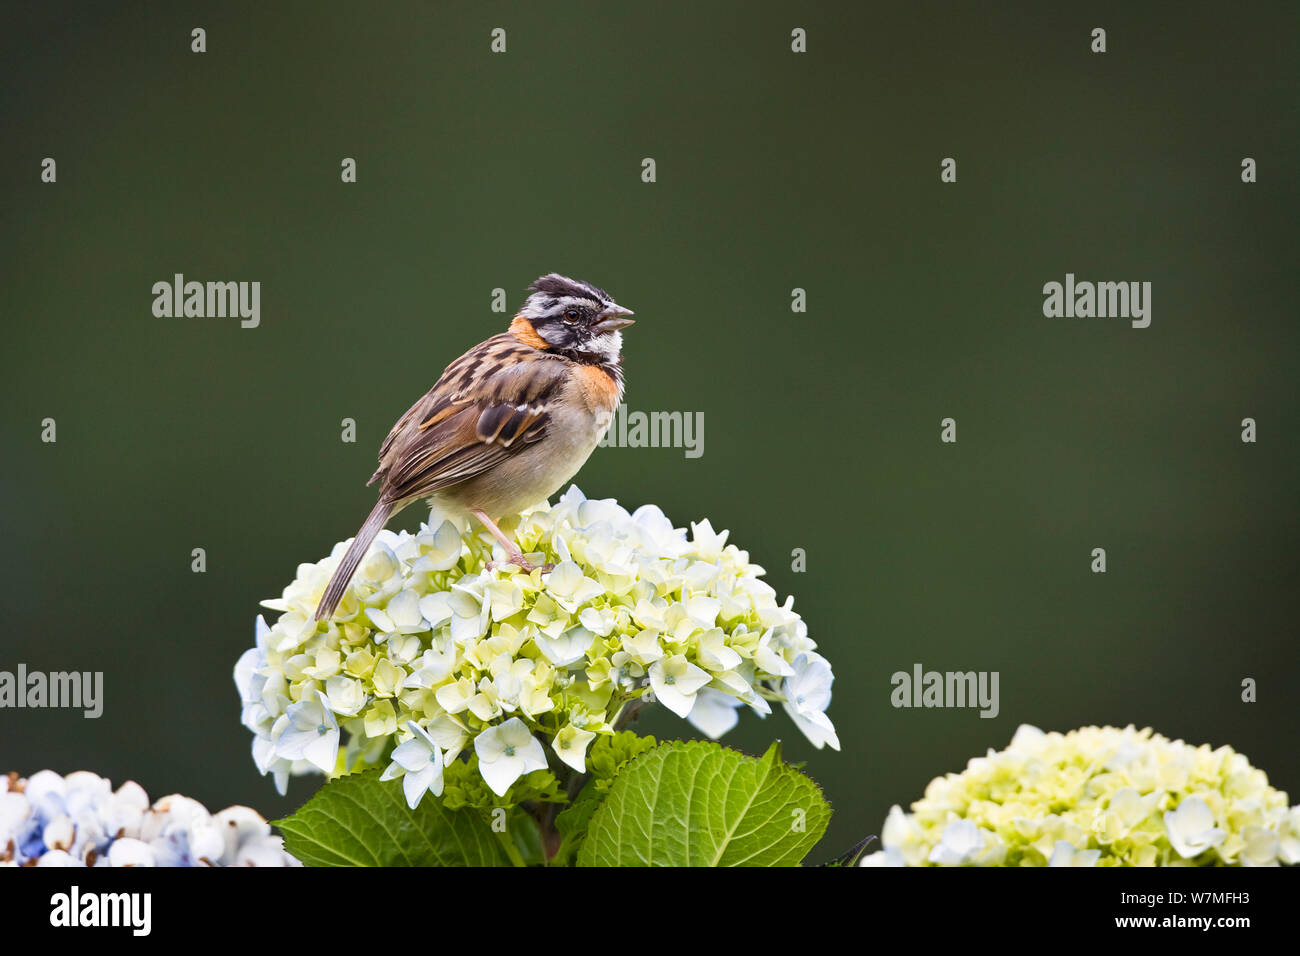 Rufous collared Sparrow (Zonotrichia capensis) singing, Costa Rica Stock Photo